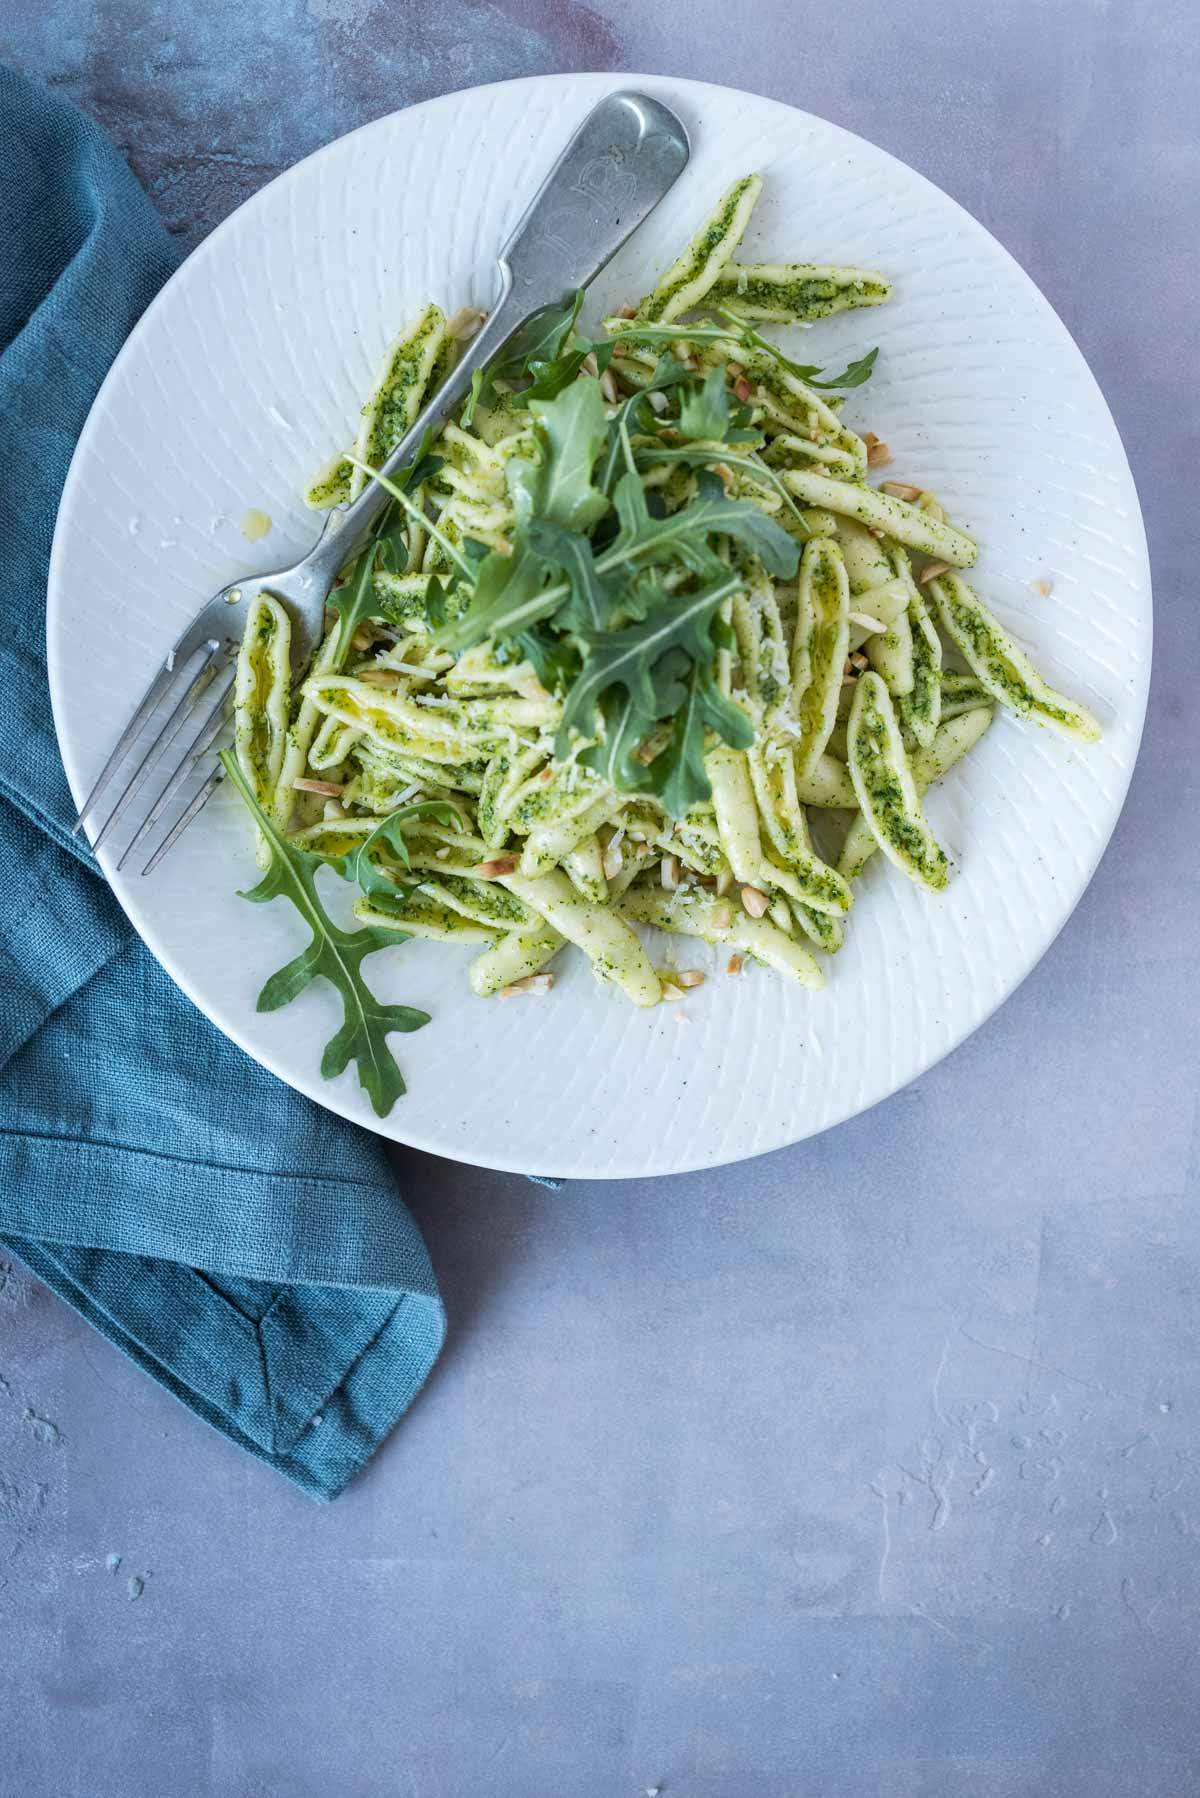 Rocket Almond Pesto Pasta | Chew Town Food Blog